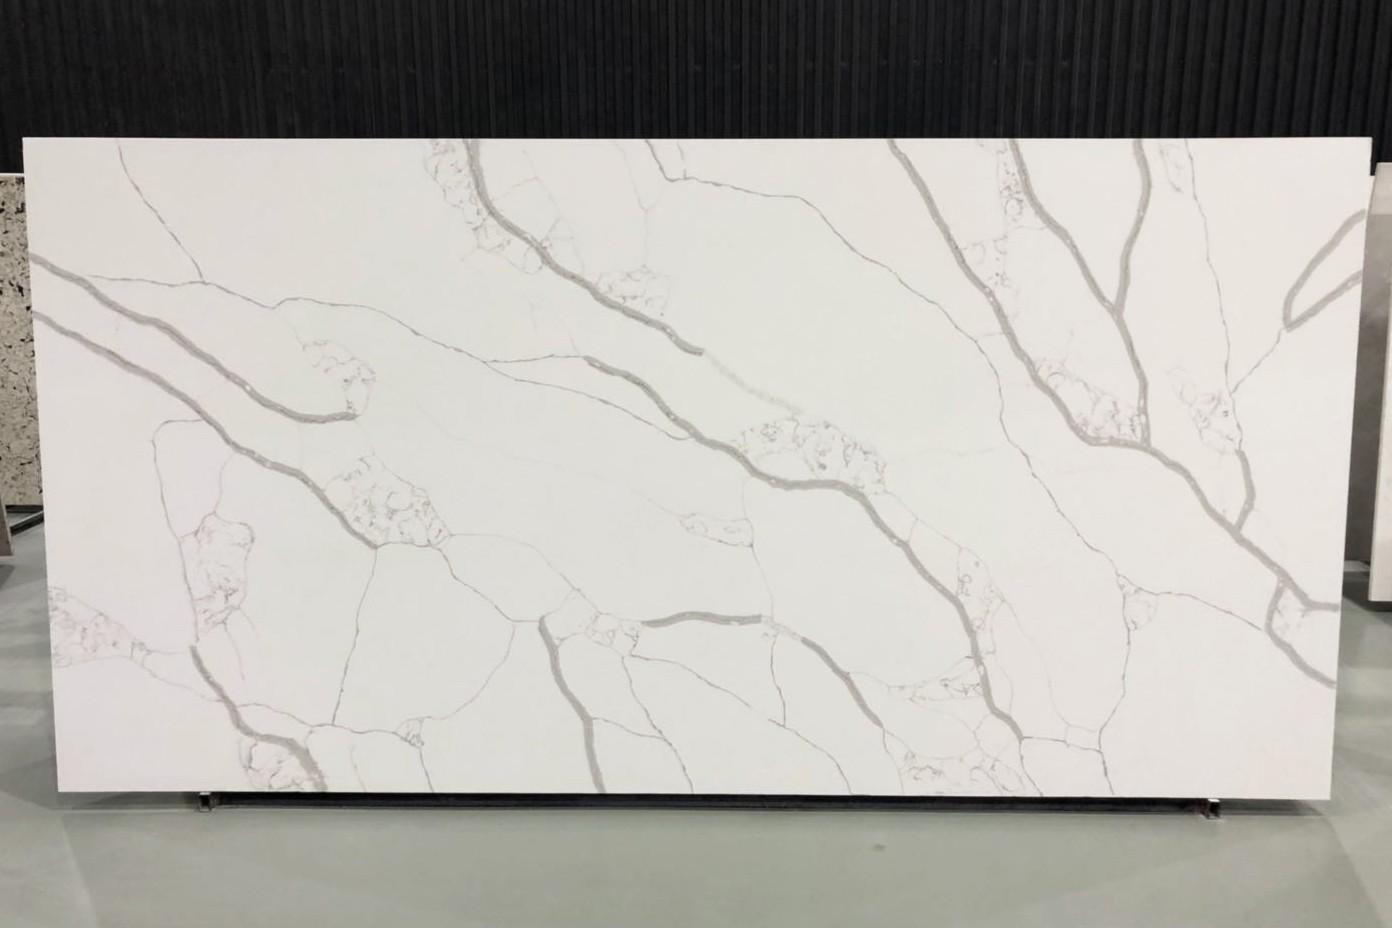 FLORENCE Supply Hai Phong (Vietnam) polished slabs V7006 , SL2CM artificial aglo quartz